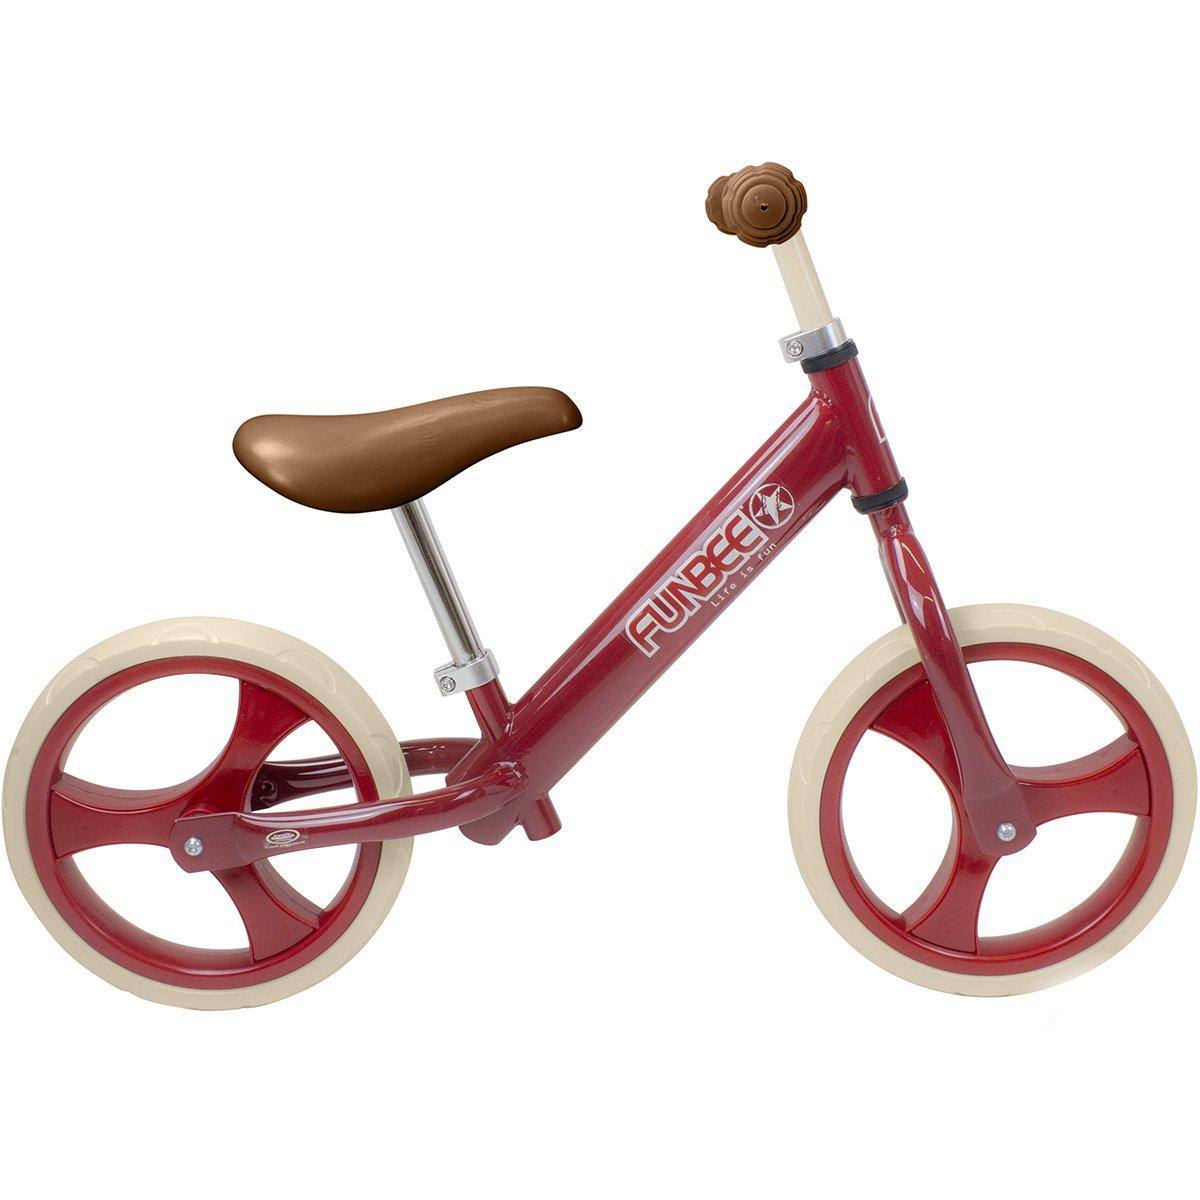 Bicicleta vintage fara pedale Funbee, Rosu, 12 inch